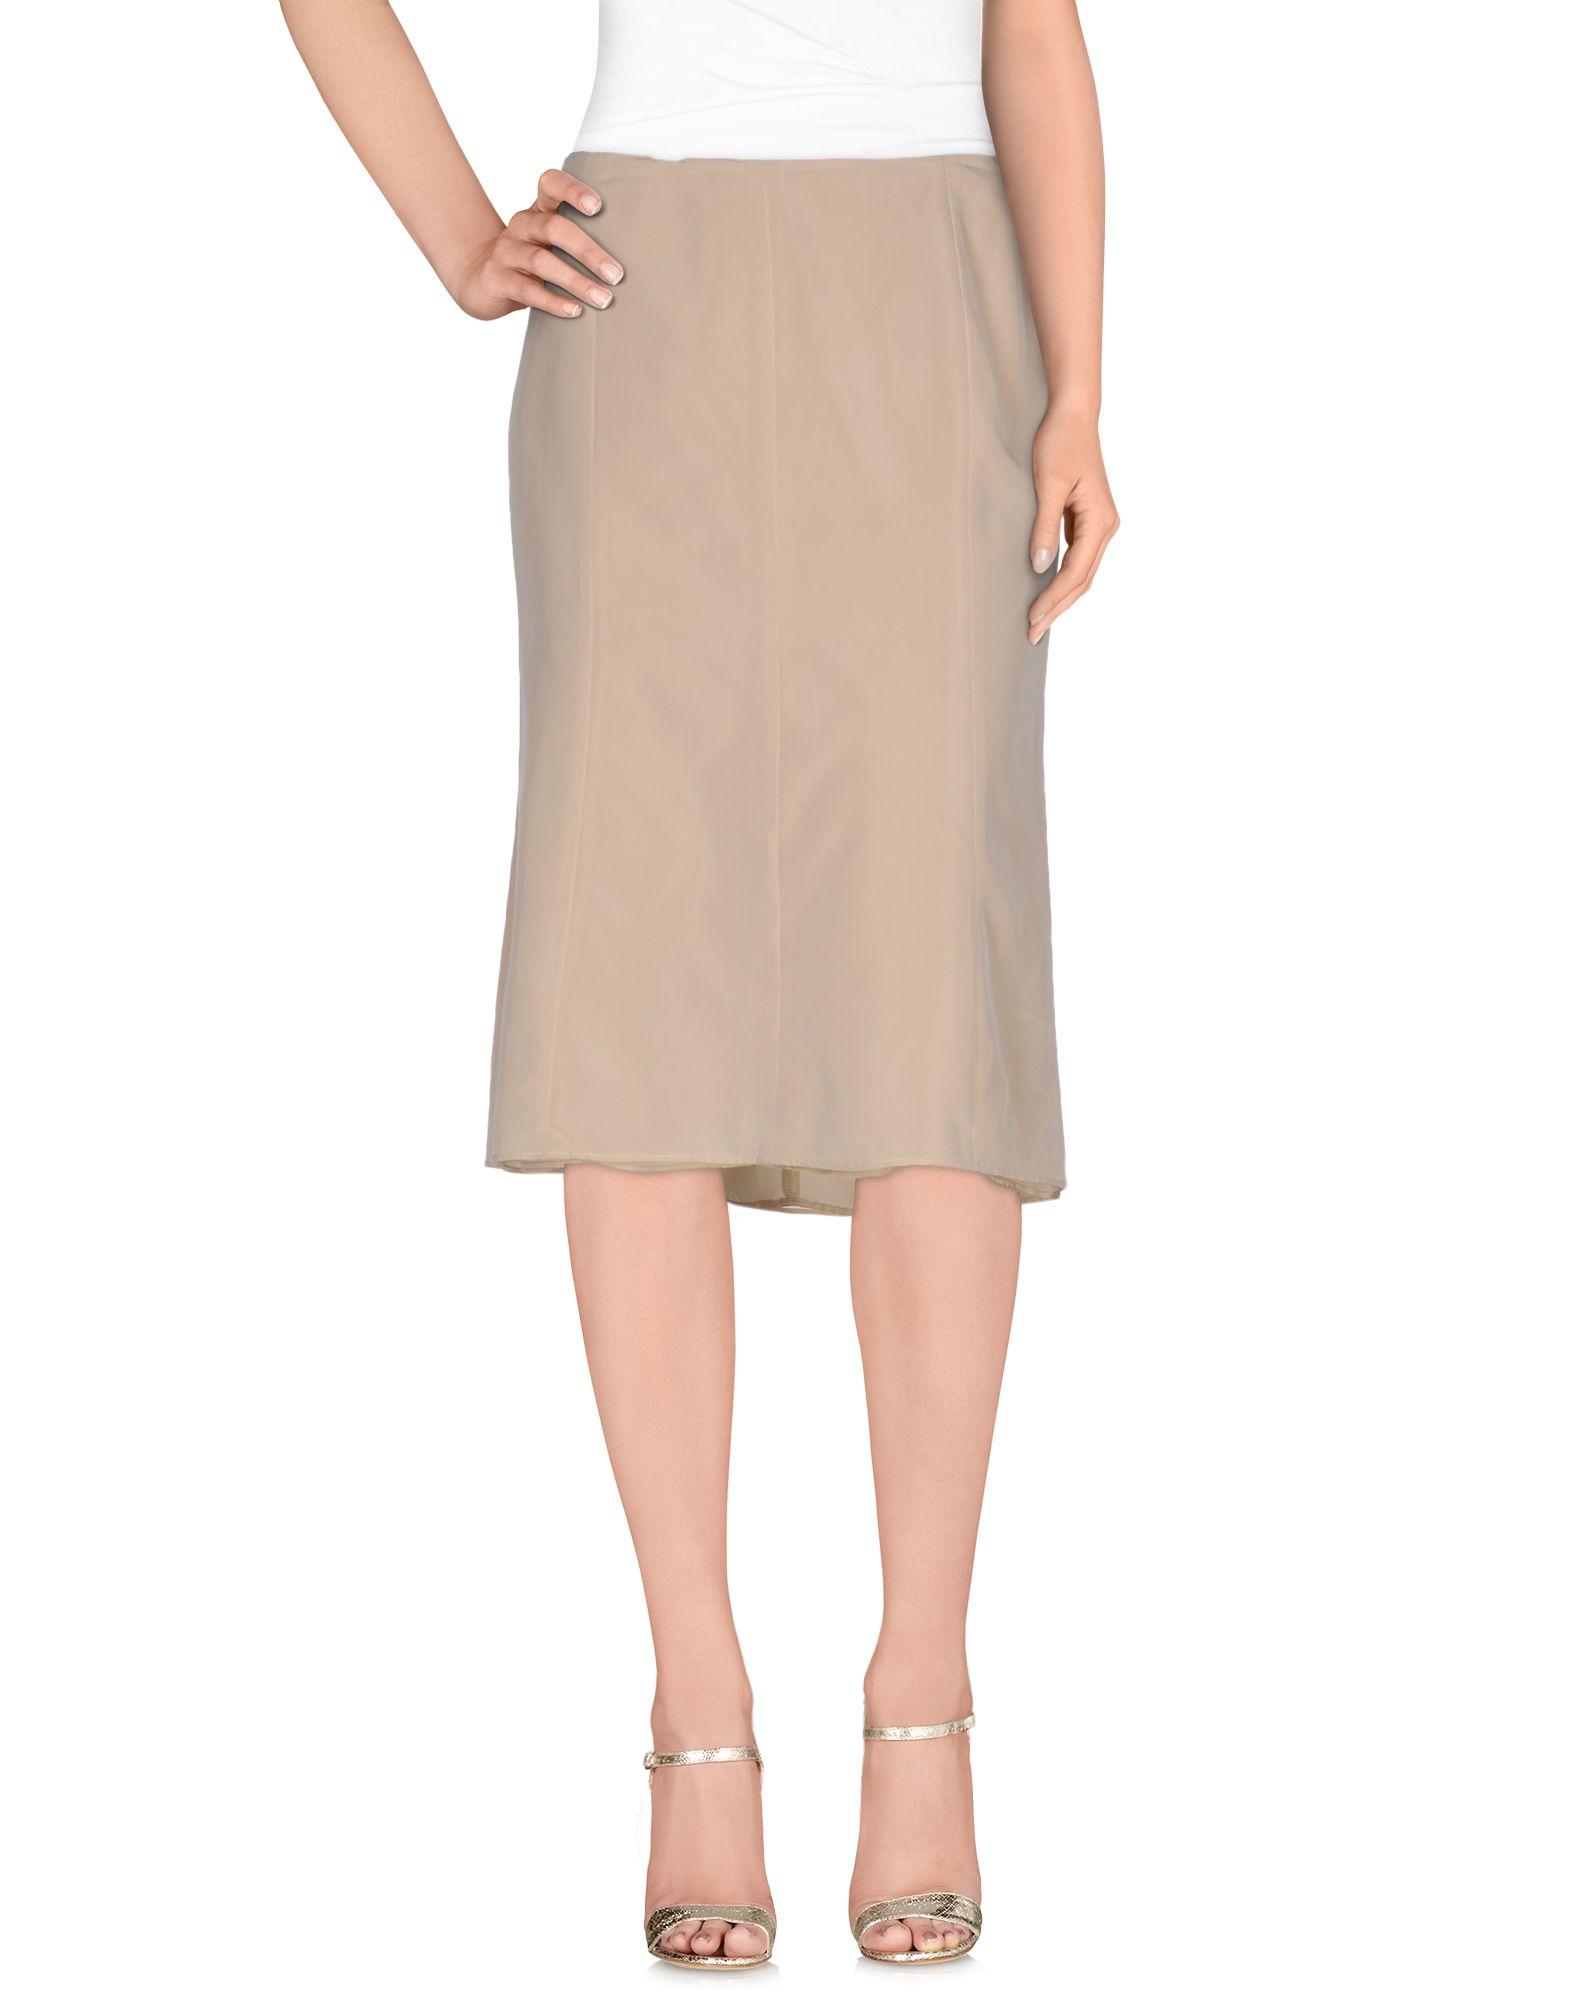 PANCALDI & B Юбка длиной 3/4 beatrice b юбка длиной 3 4